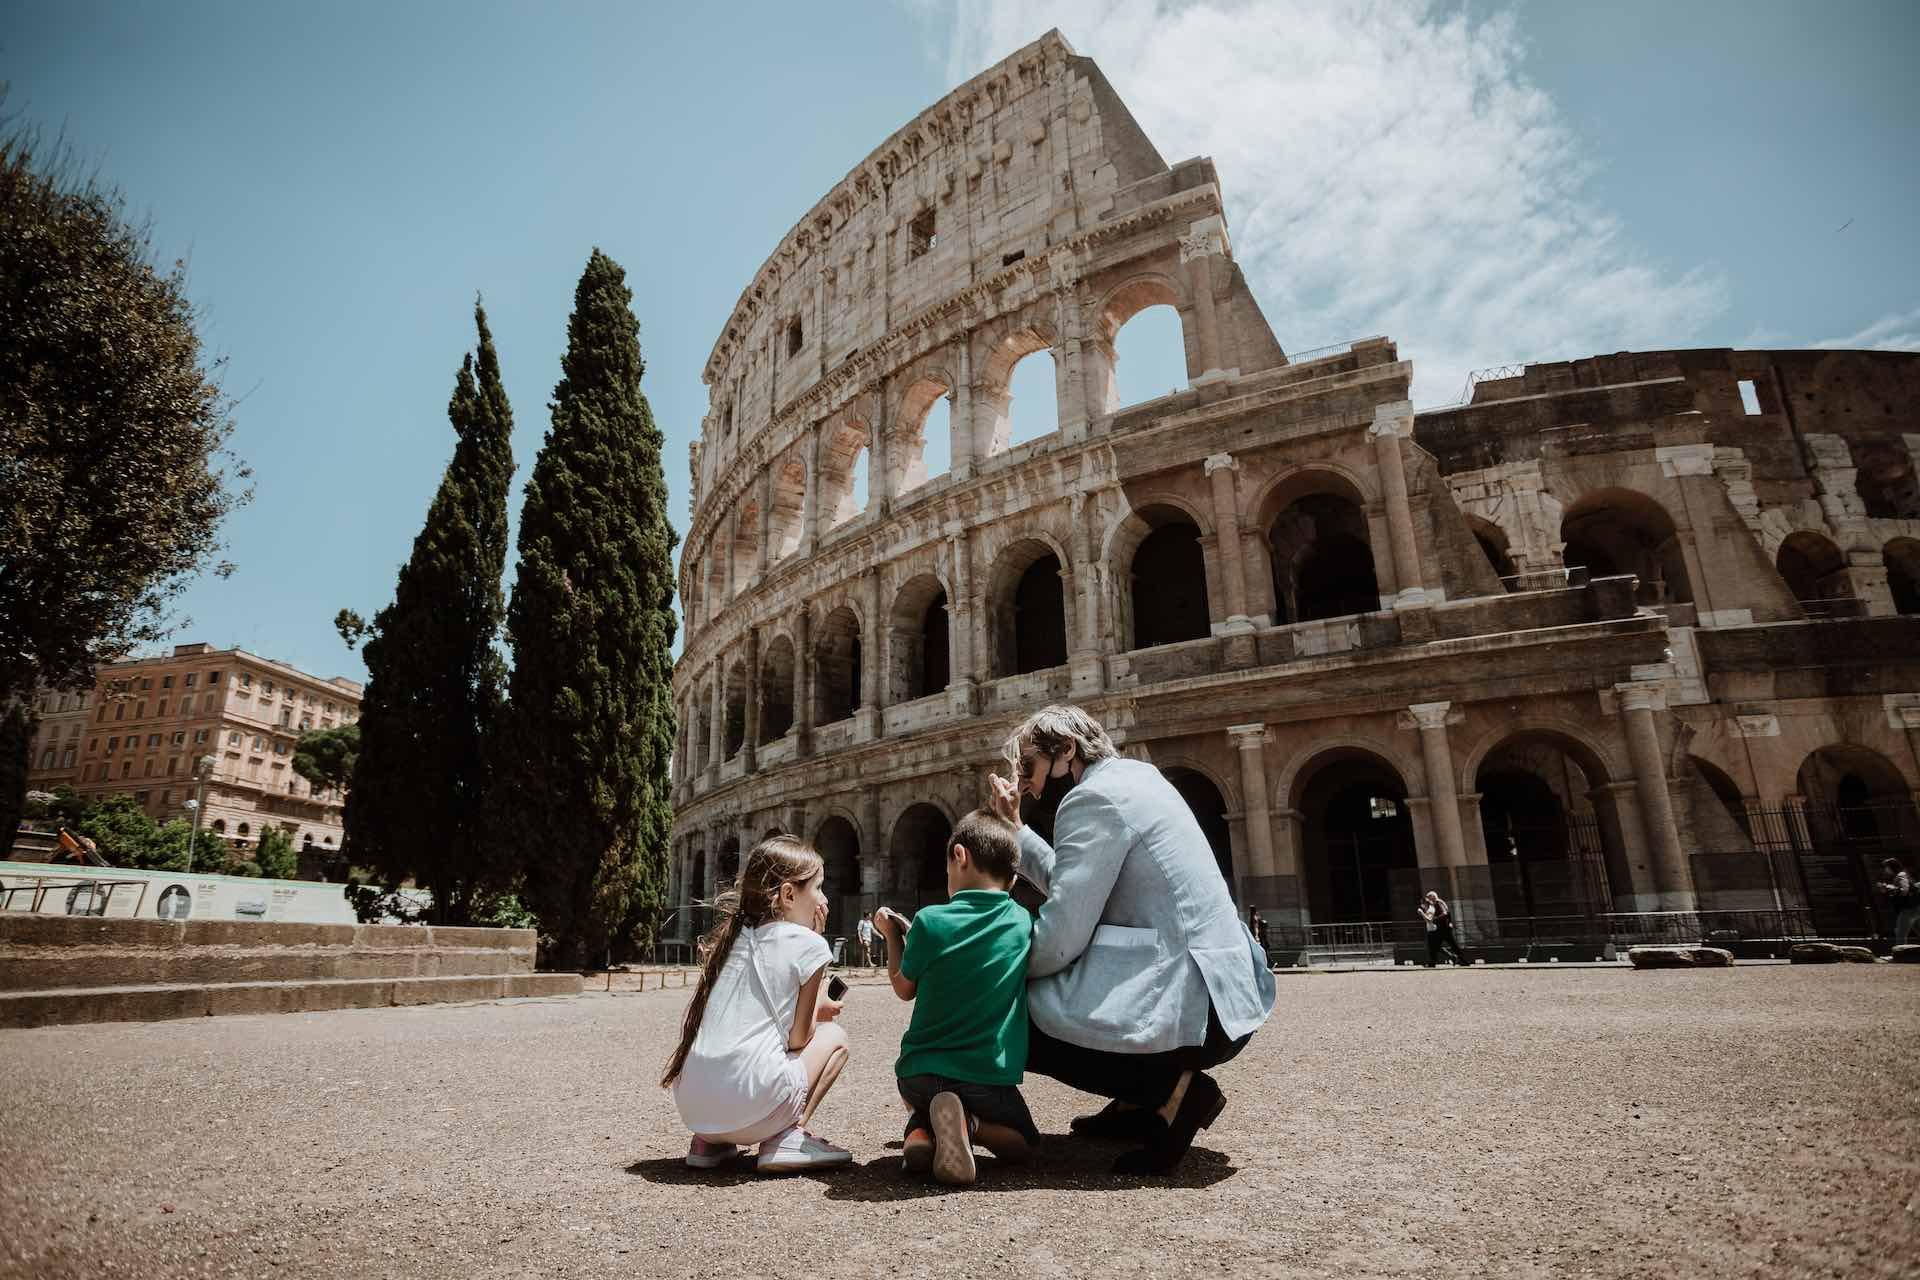 Pix comprimido por el Coliseo de Roma Tour =